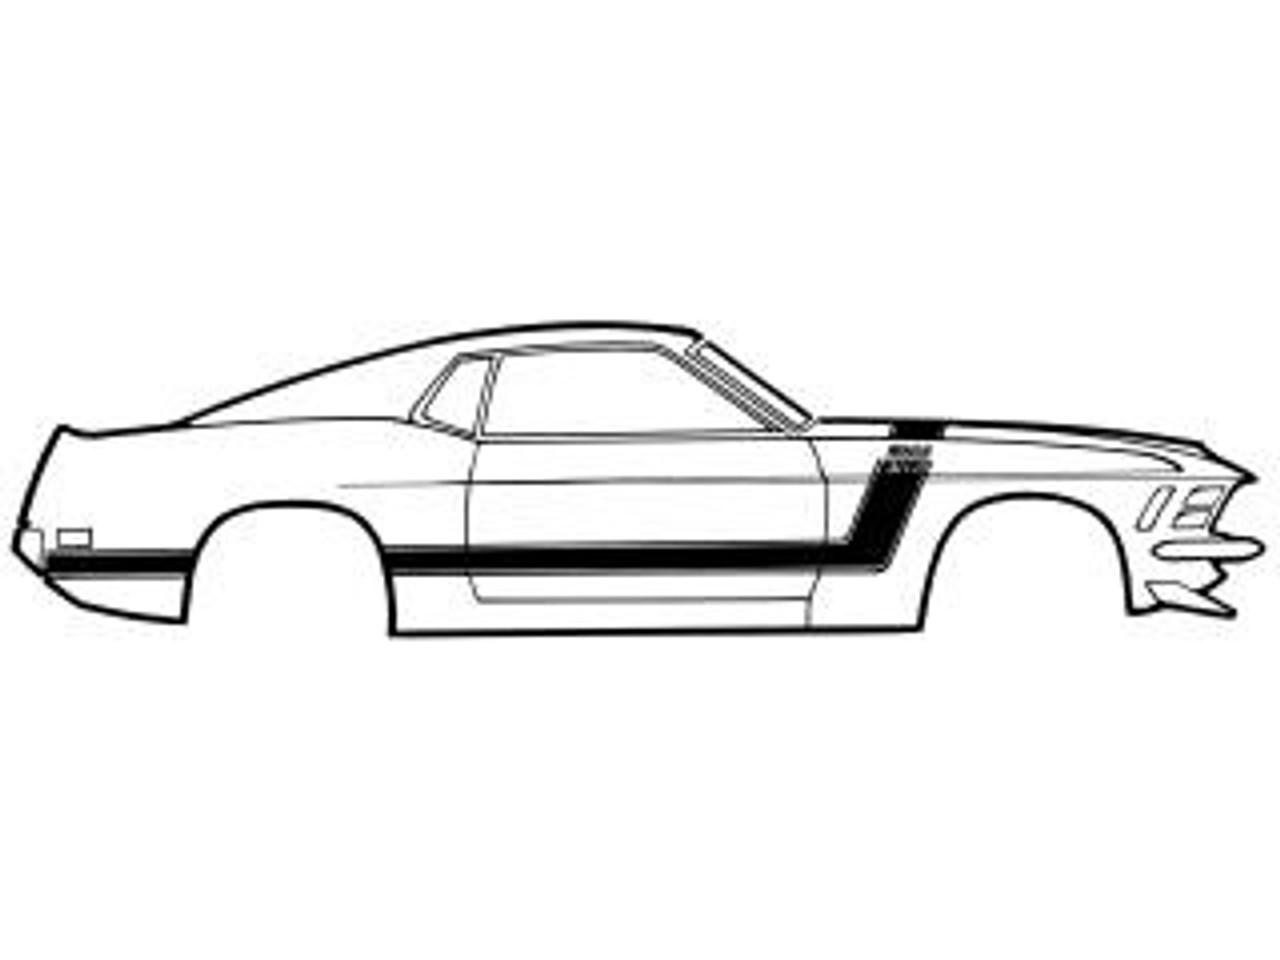 Boss Shelby-Windshield Molding Clip Set /& Sealer 1969-1970 Mustang